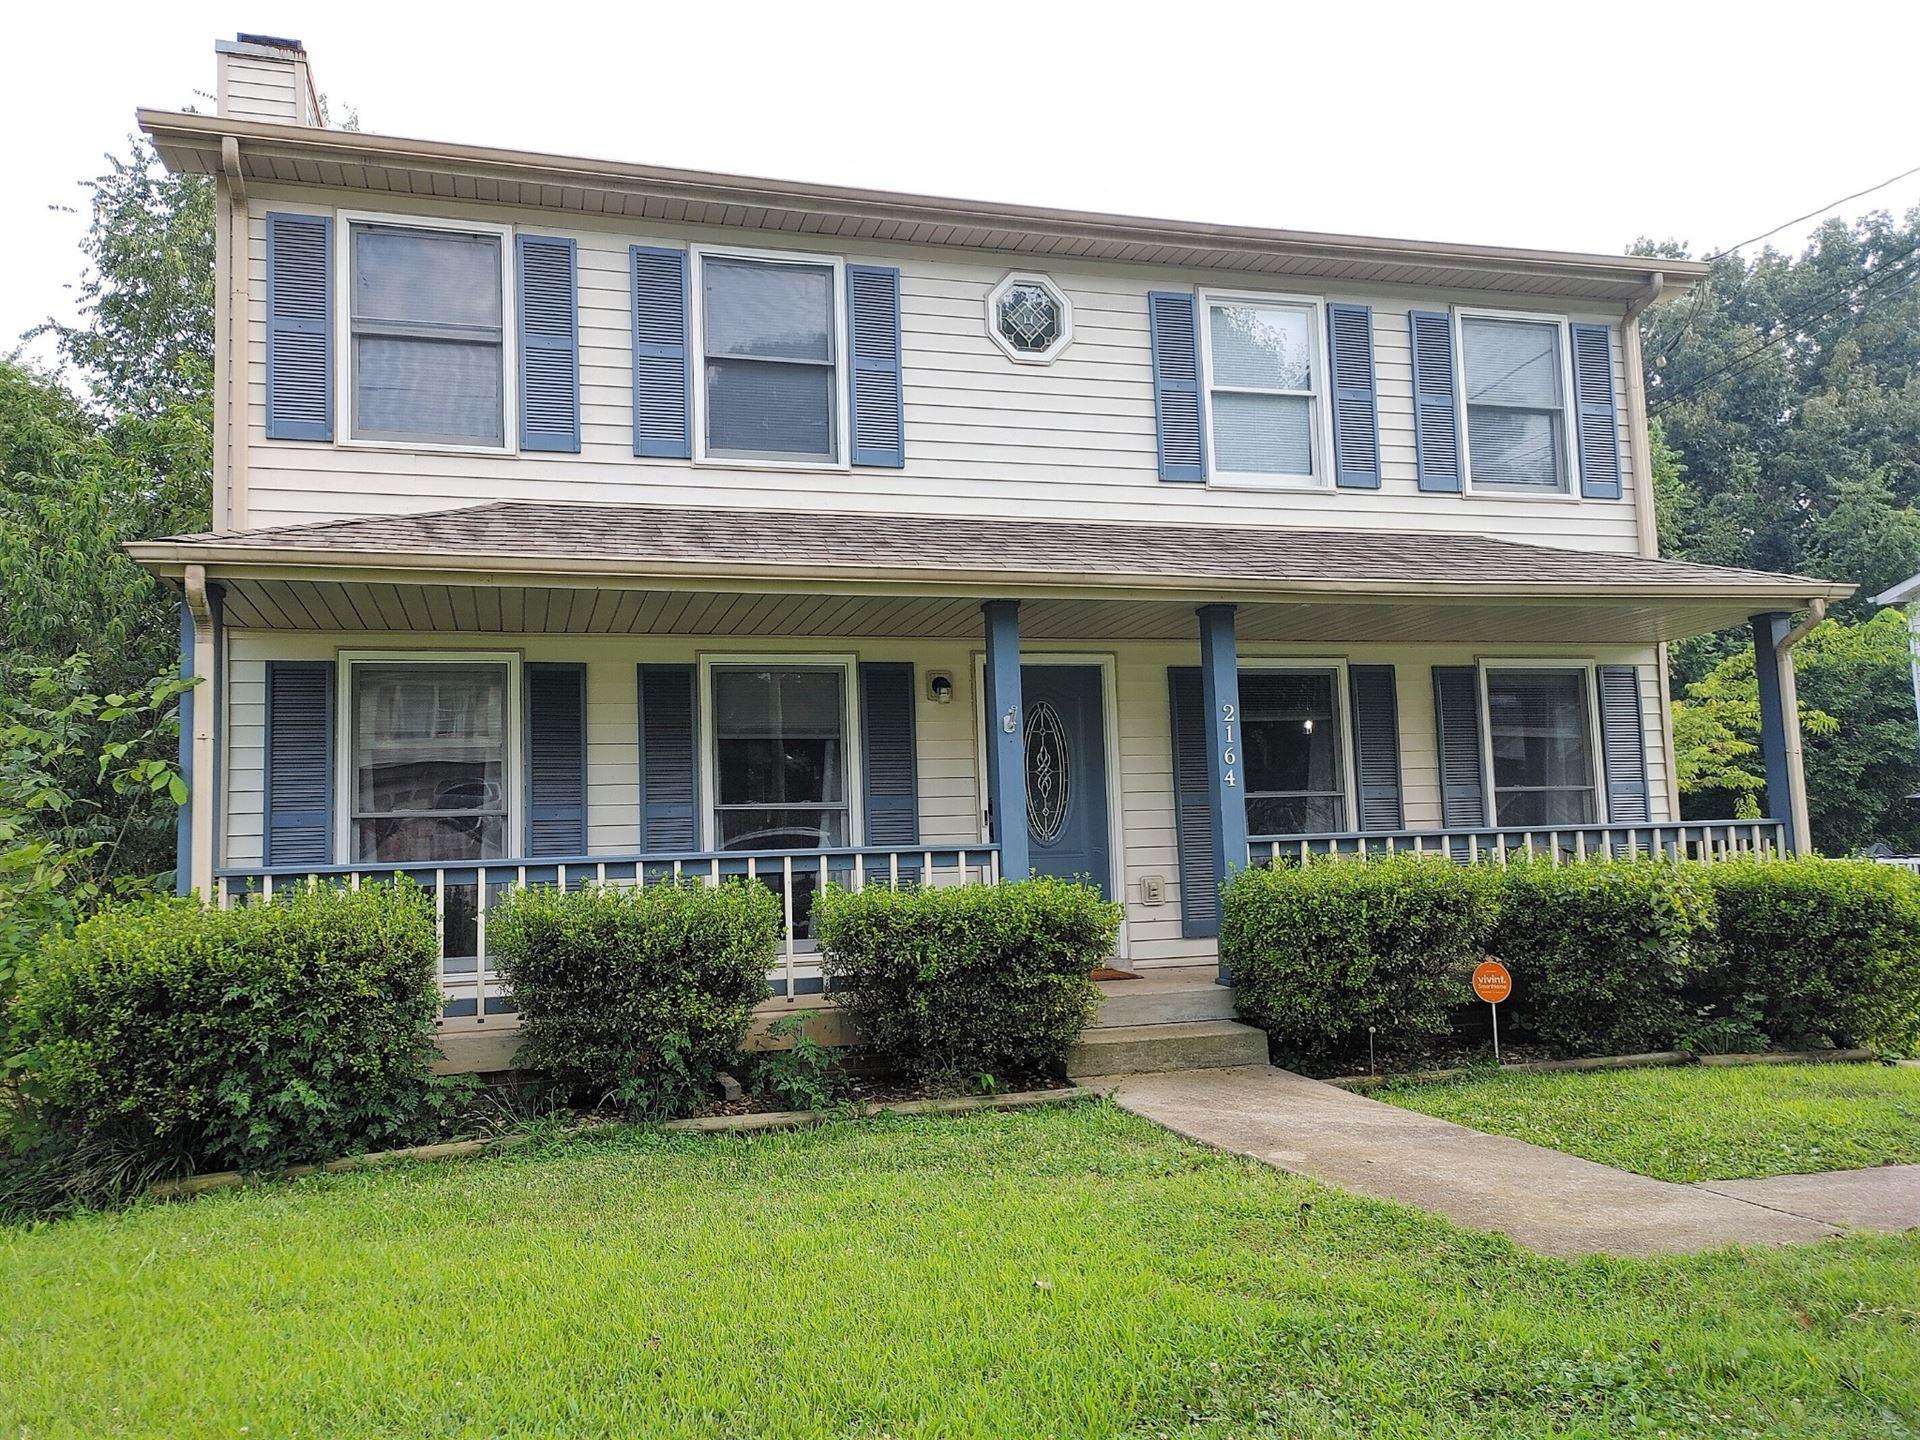 2164 Amadeus Dr, Clarksville, TN 37040 - MLS#: 2277241